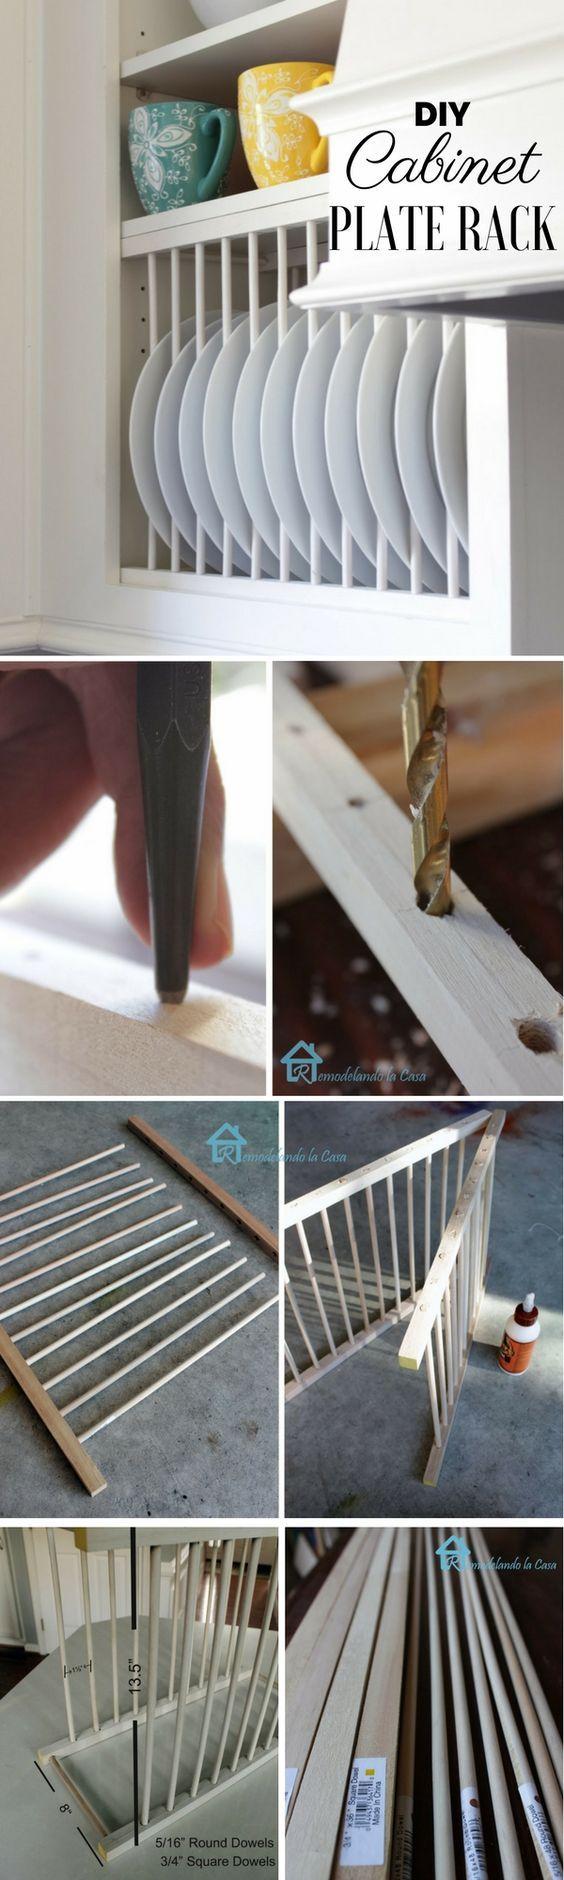 Under cabinet plate rack plans free - 15 Organization Diys That Will Make Your Kitchen Pretty Plate Rackscabinet Plate Rackkitchen